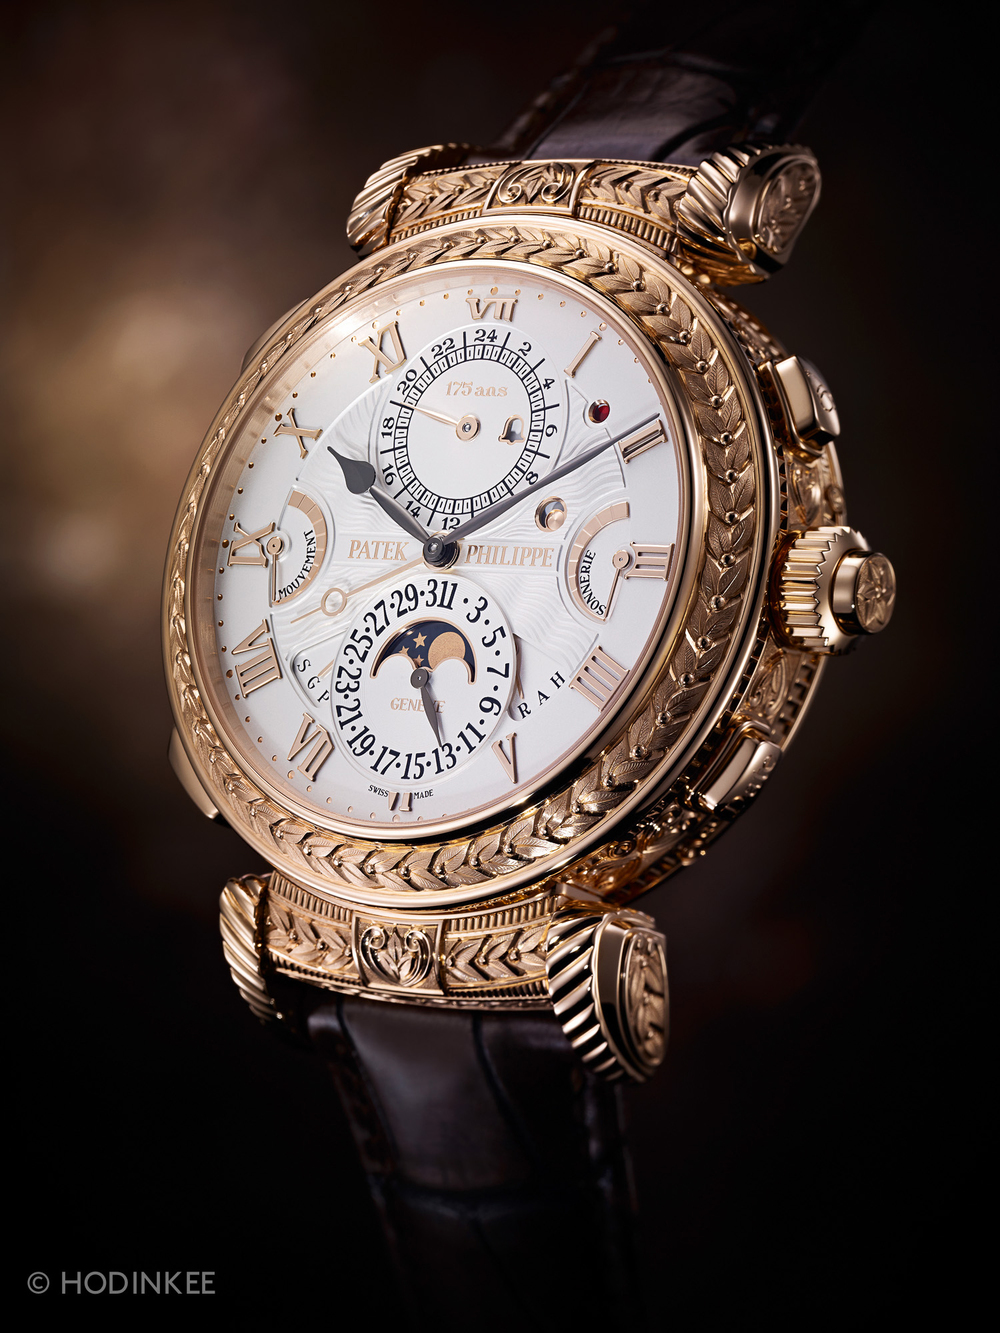 sale retailer ab940 ee99e 世界最高峰】超高級時計パテックフィリップまとめ【時計界の頂点 ...